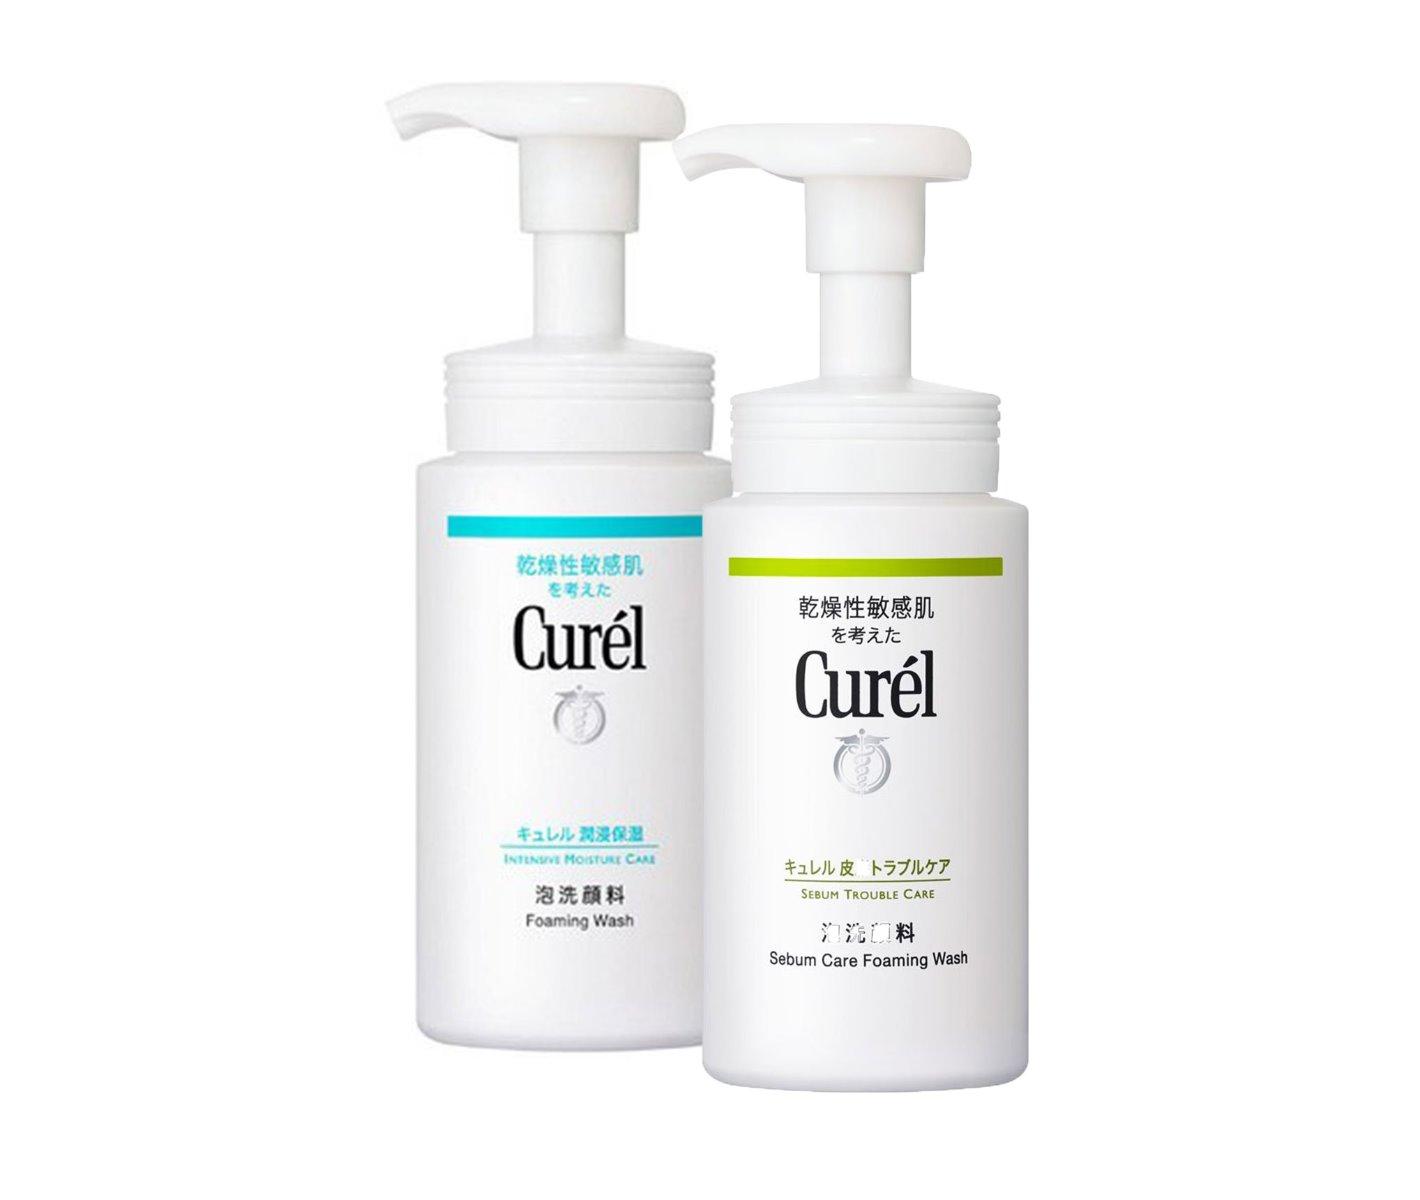 Sữa rửa mặt Curel có tốt không